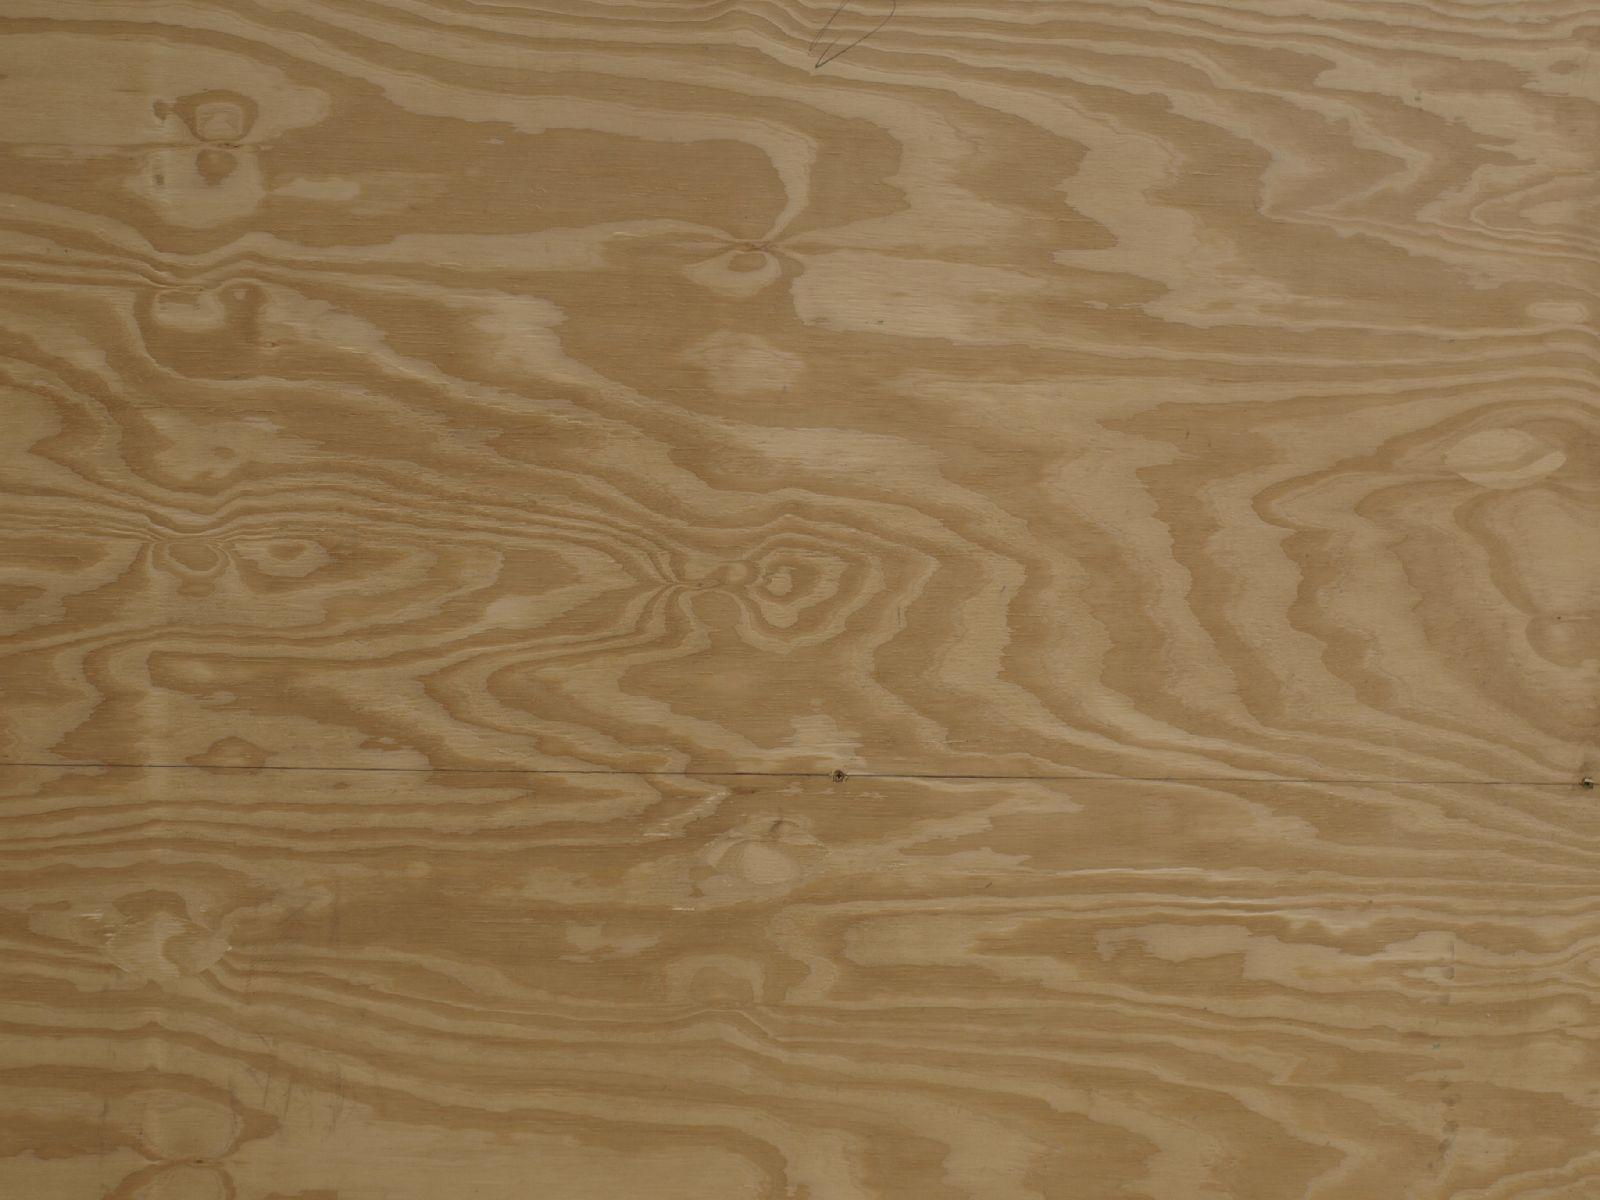 Wood_Texture_A_P4041485